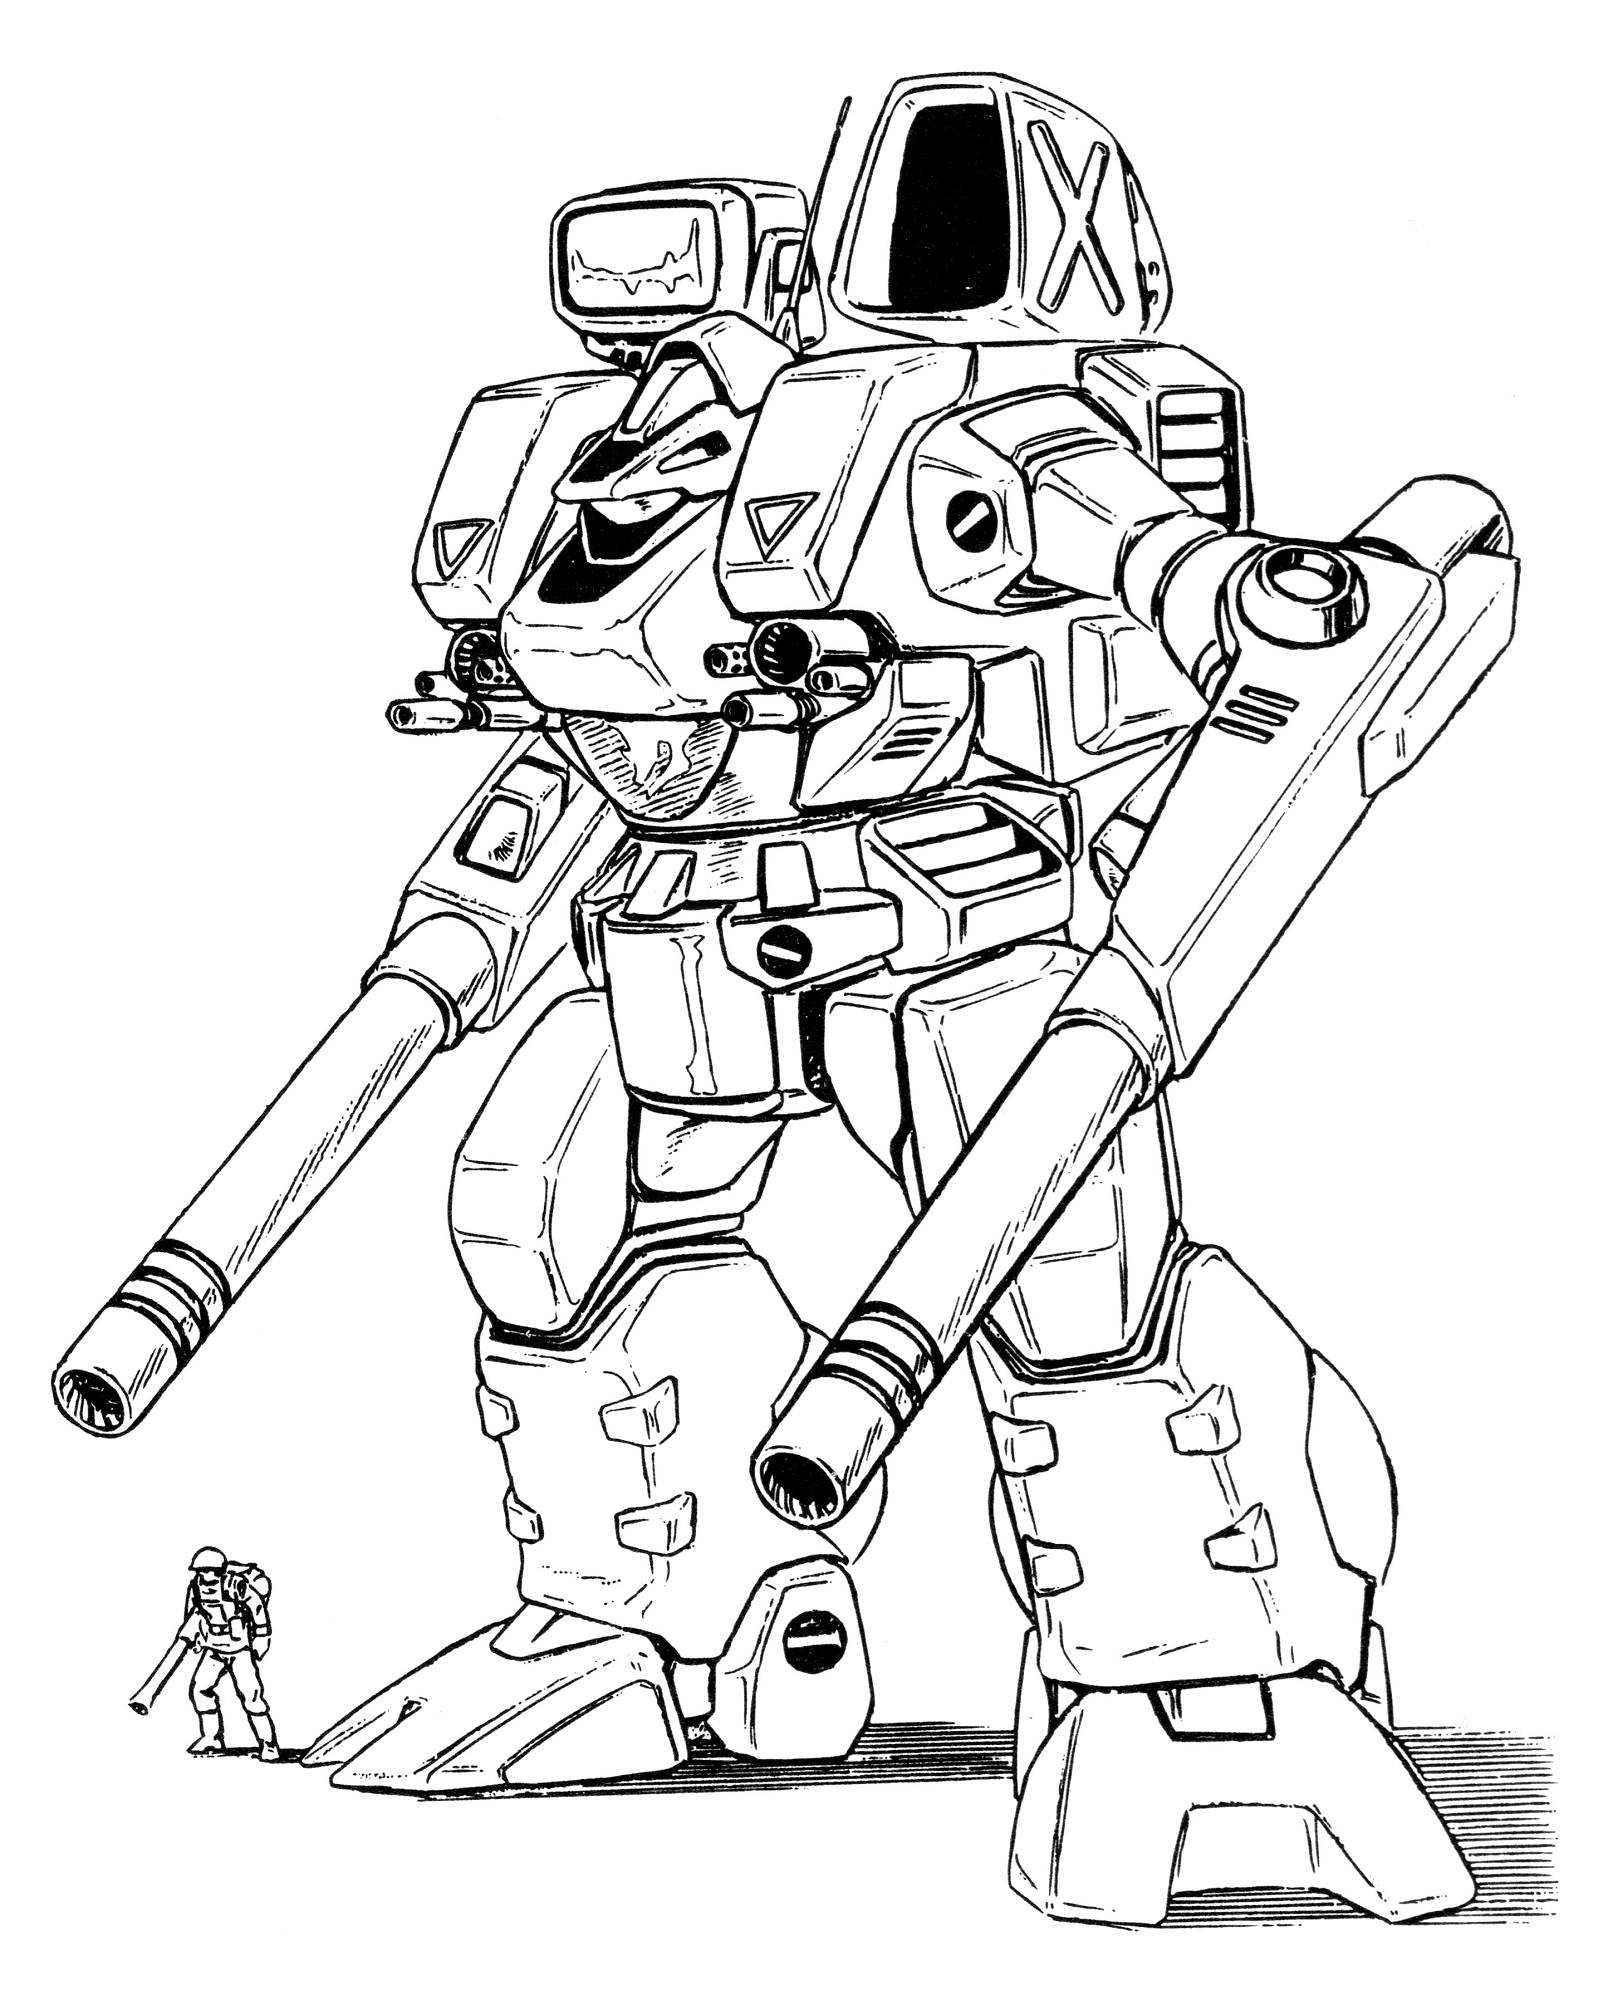 Vickers Chrysler Mbr 04 Mk Vi Tomahawk Main Battle Robot